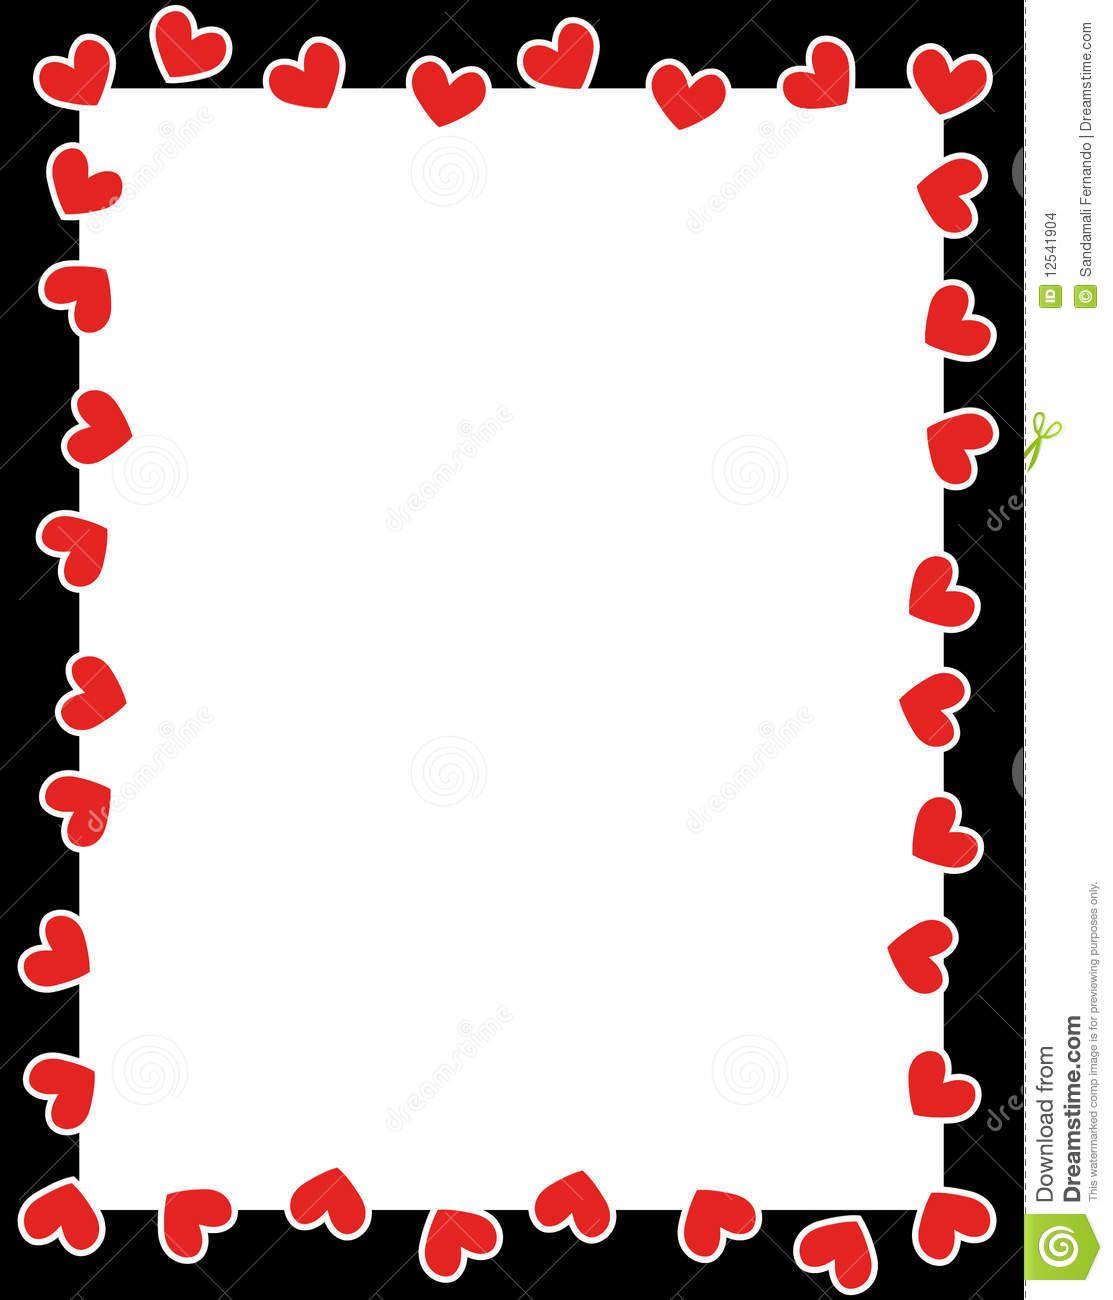 hight resolution of 450x464 pe world clipart 1113x1300 valentines day clip art valentine s day clip art borders